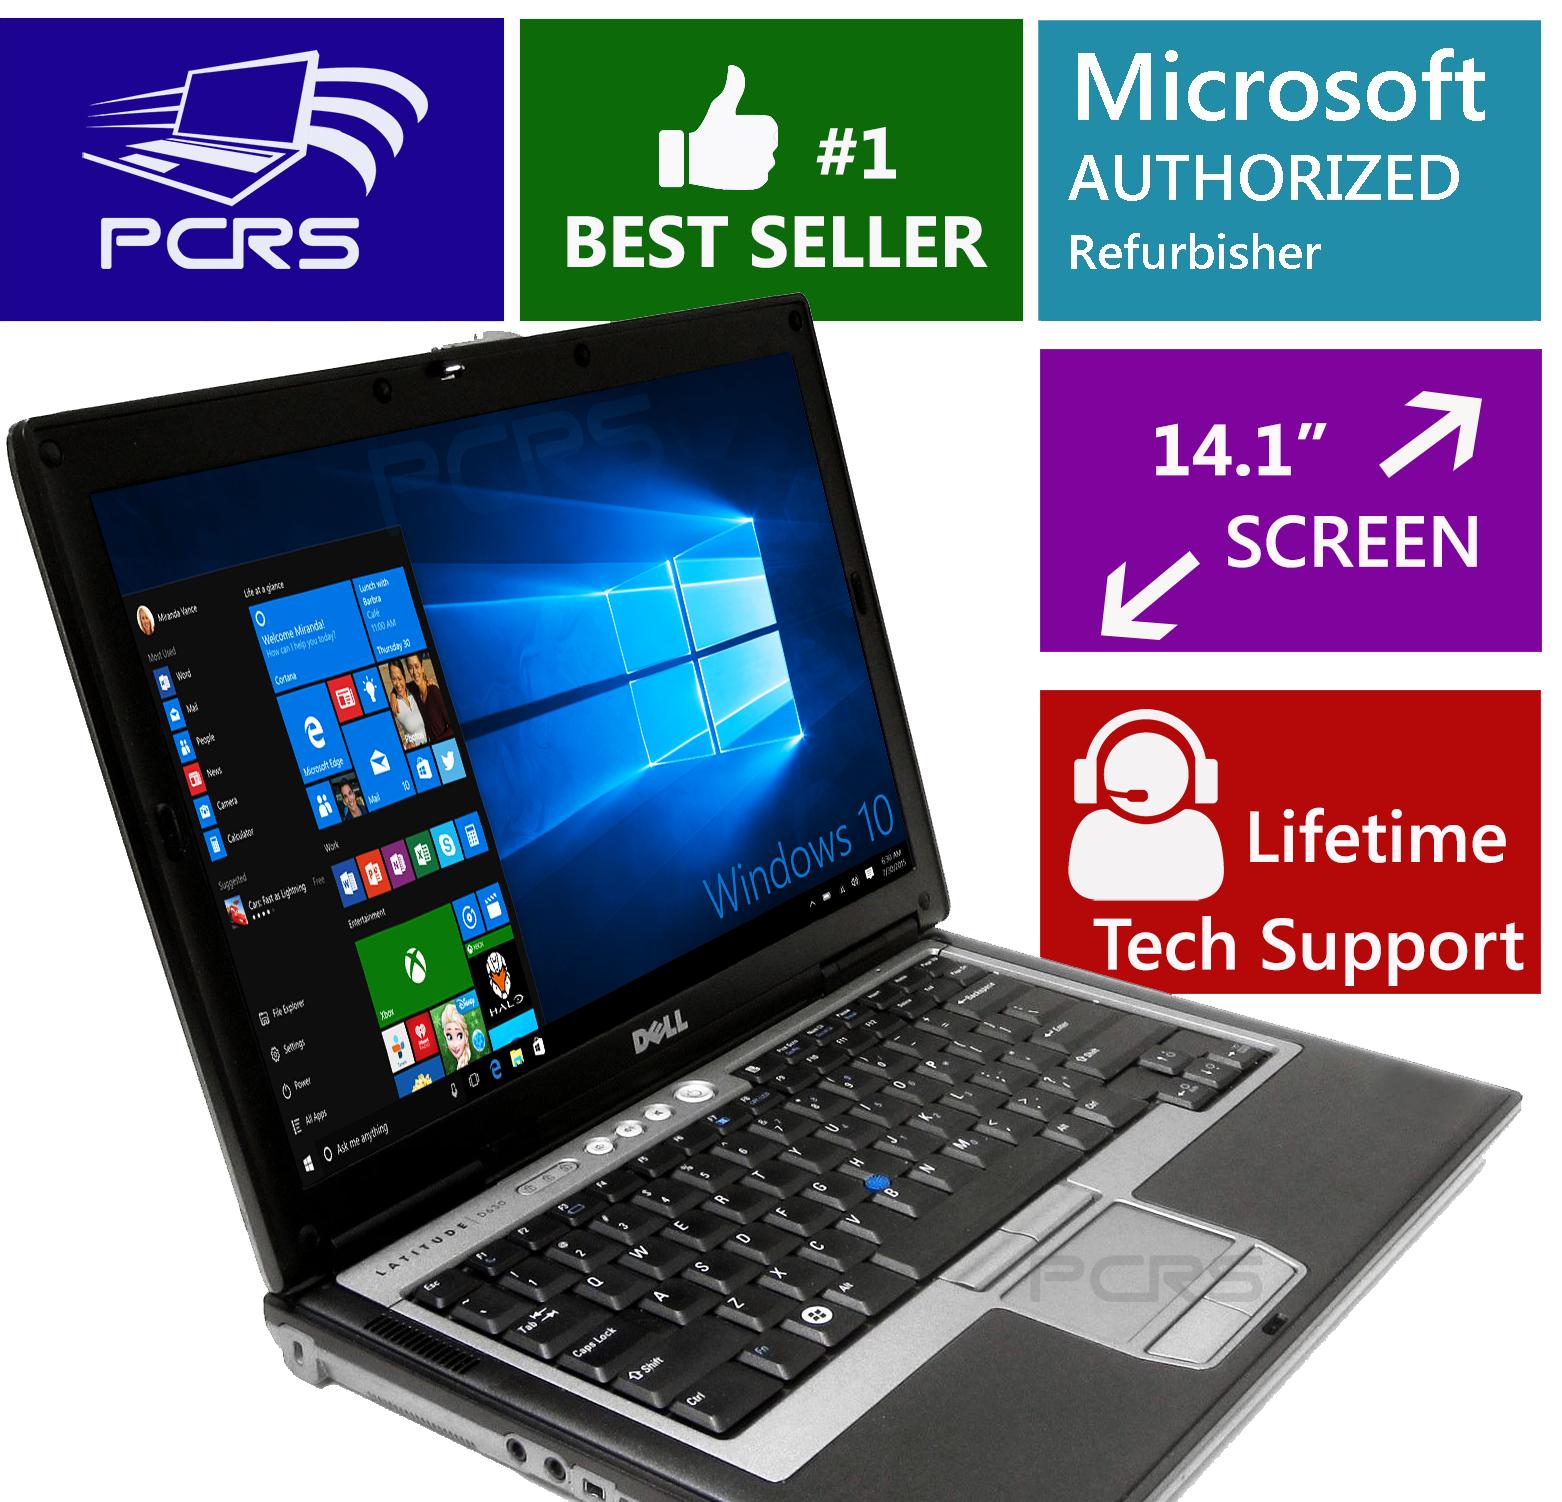 Laptop Windows - DELL Latitude Laptop Windows 10 Intel Core 2 Duo DVD WiFi Notebook HD Computer